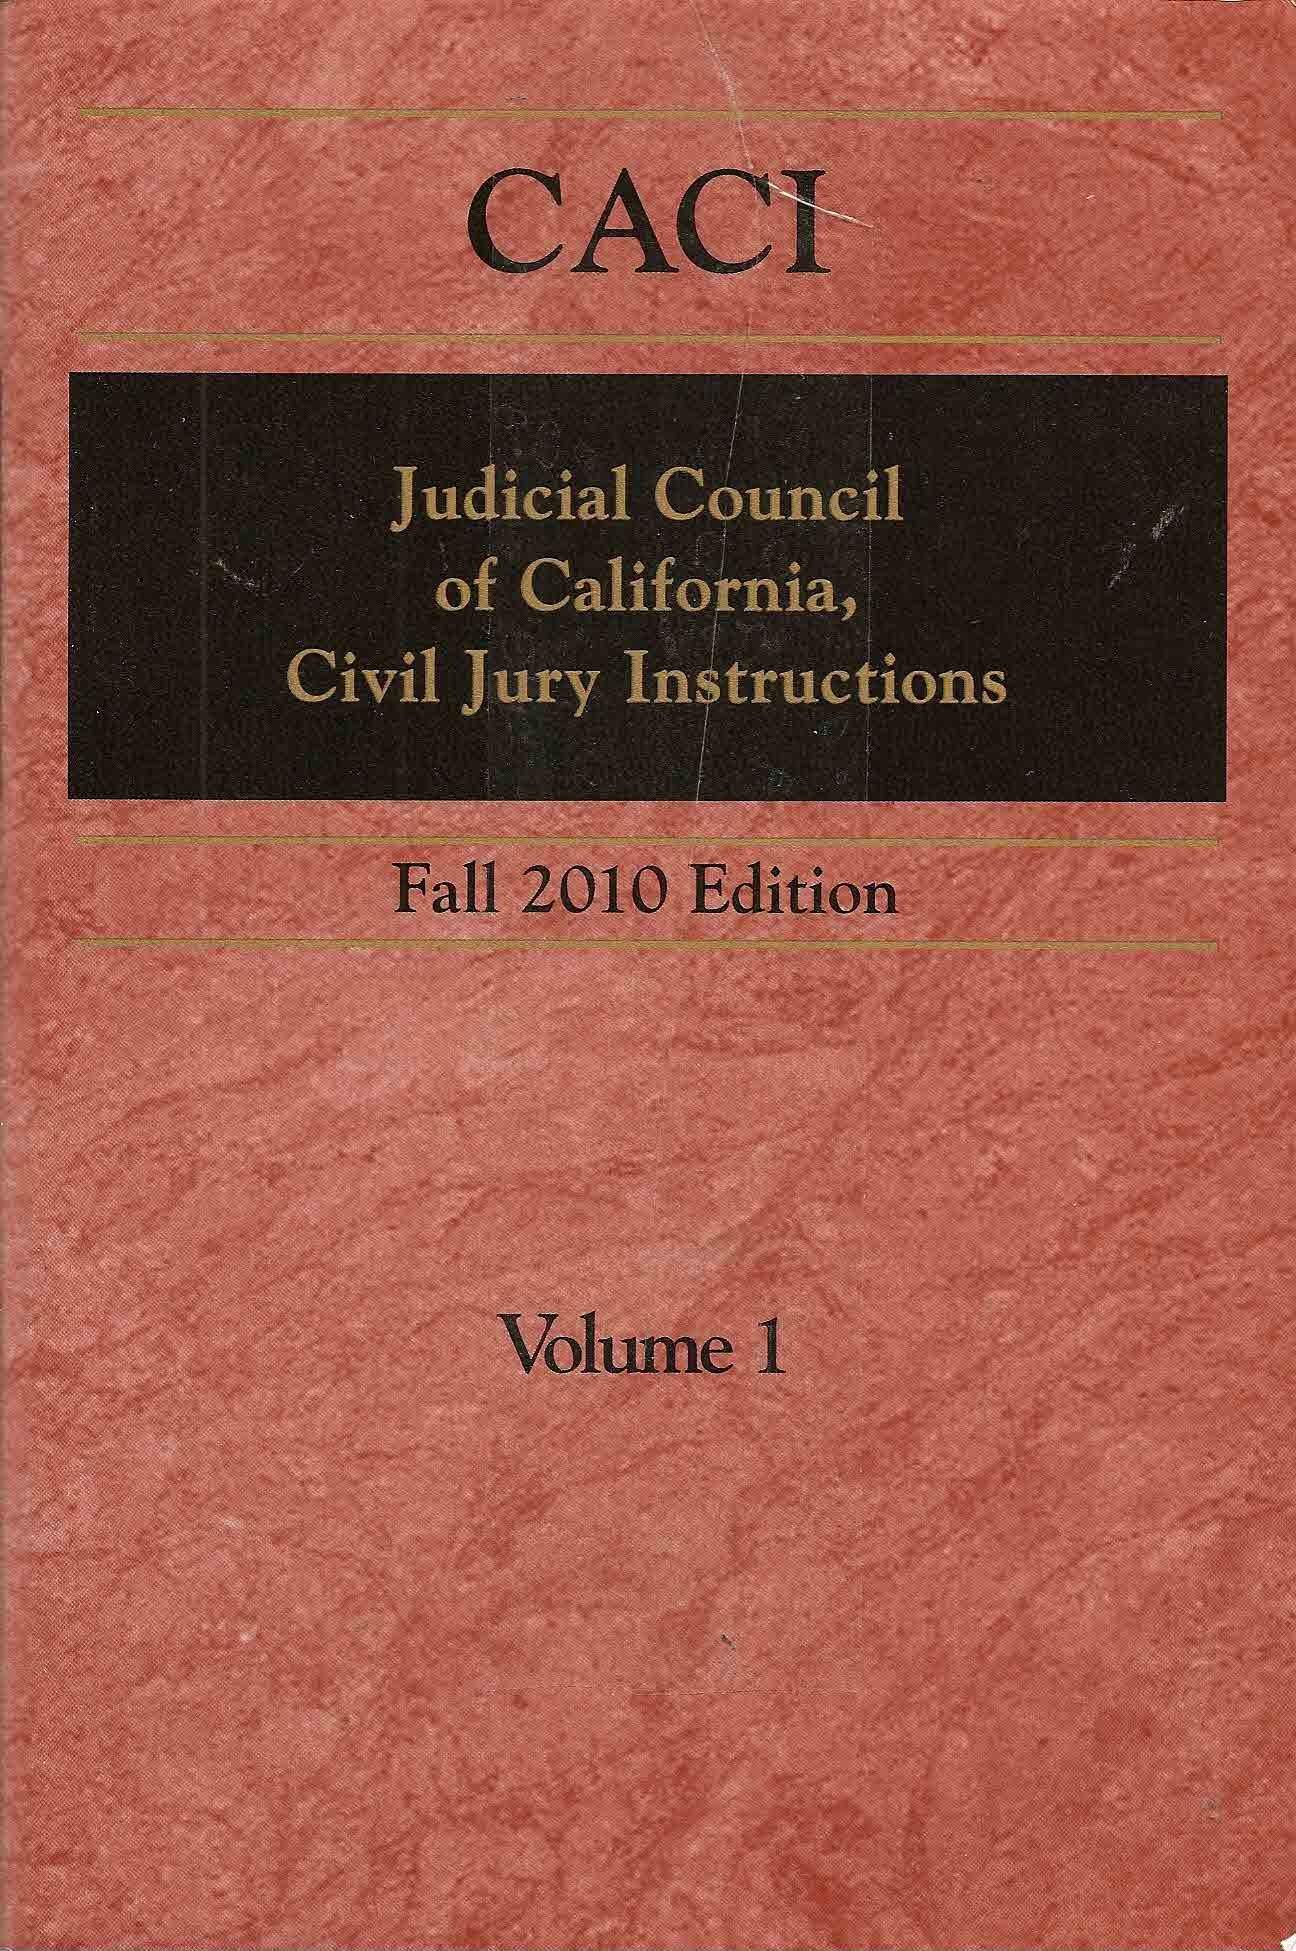 Caci Judicial Council Of California Civil Jury Instructions Fall